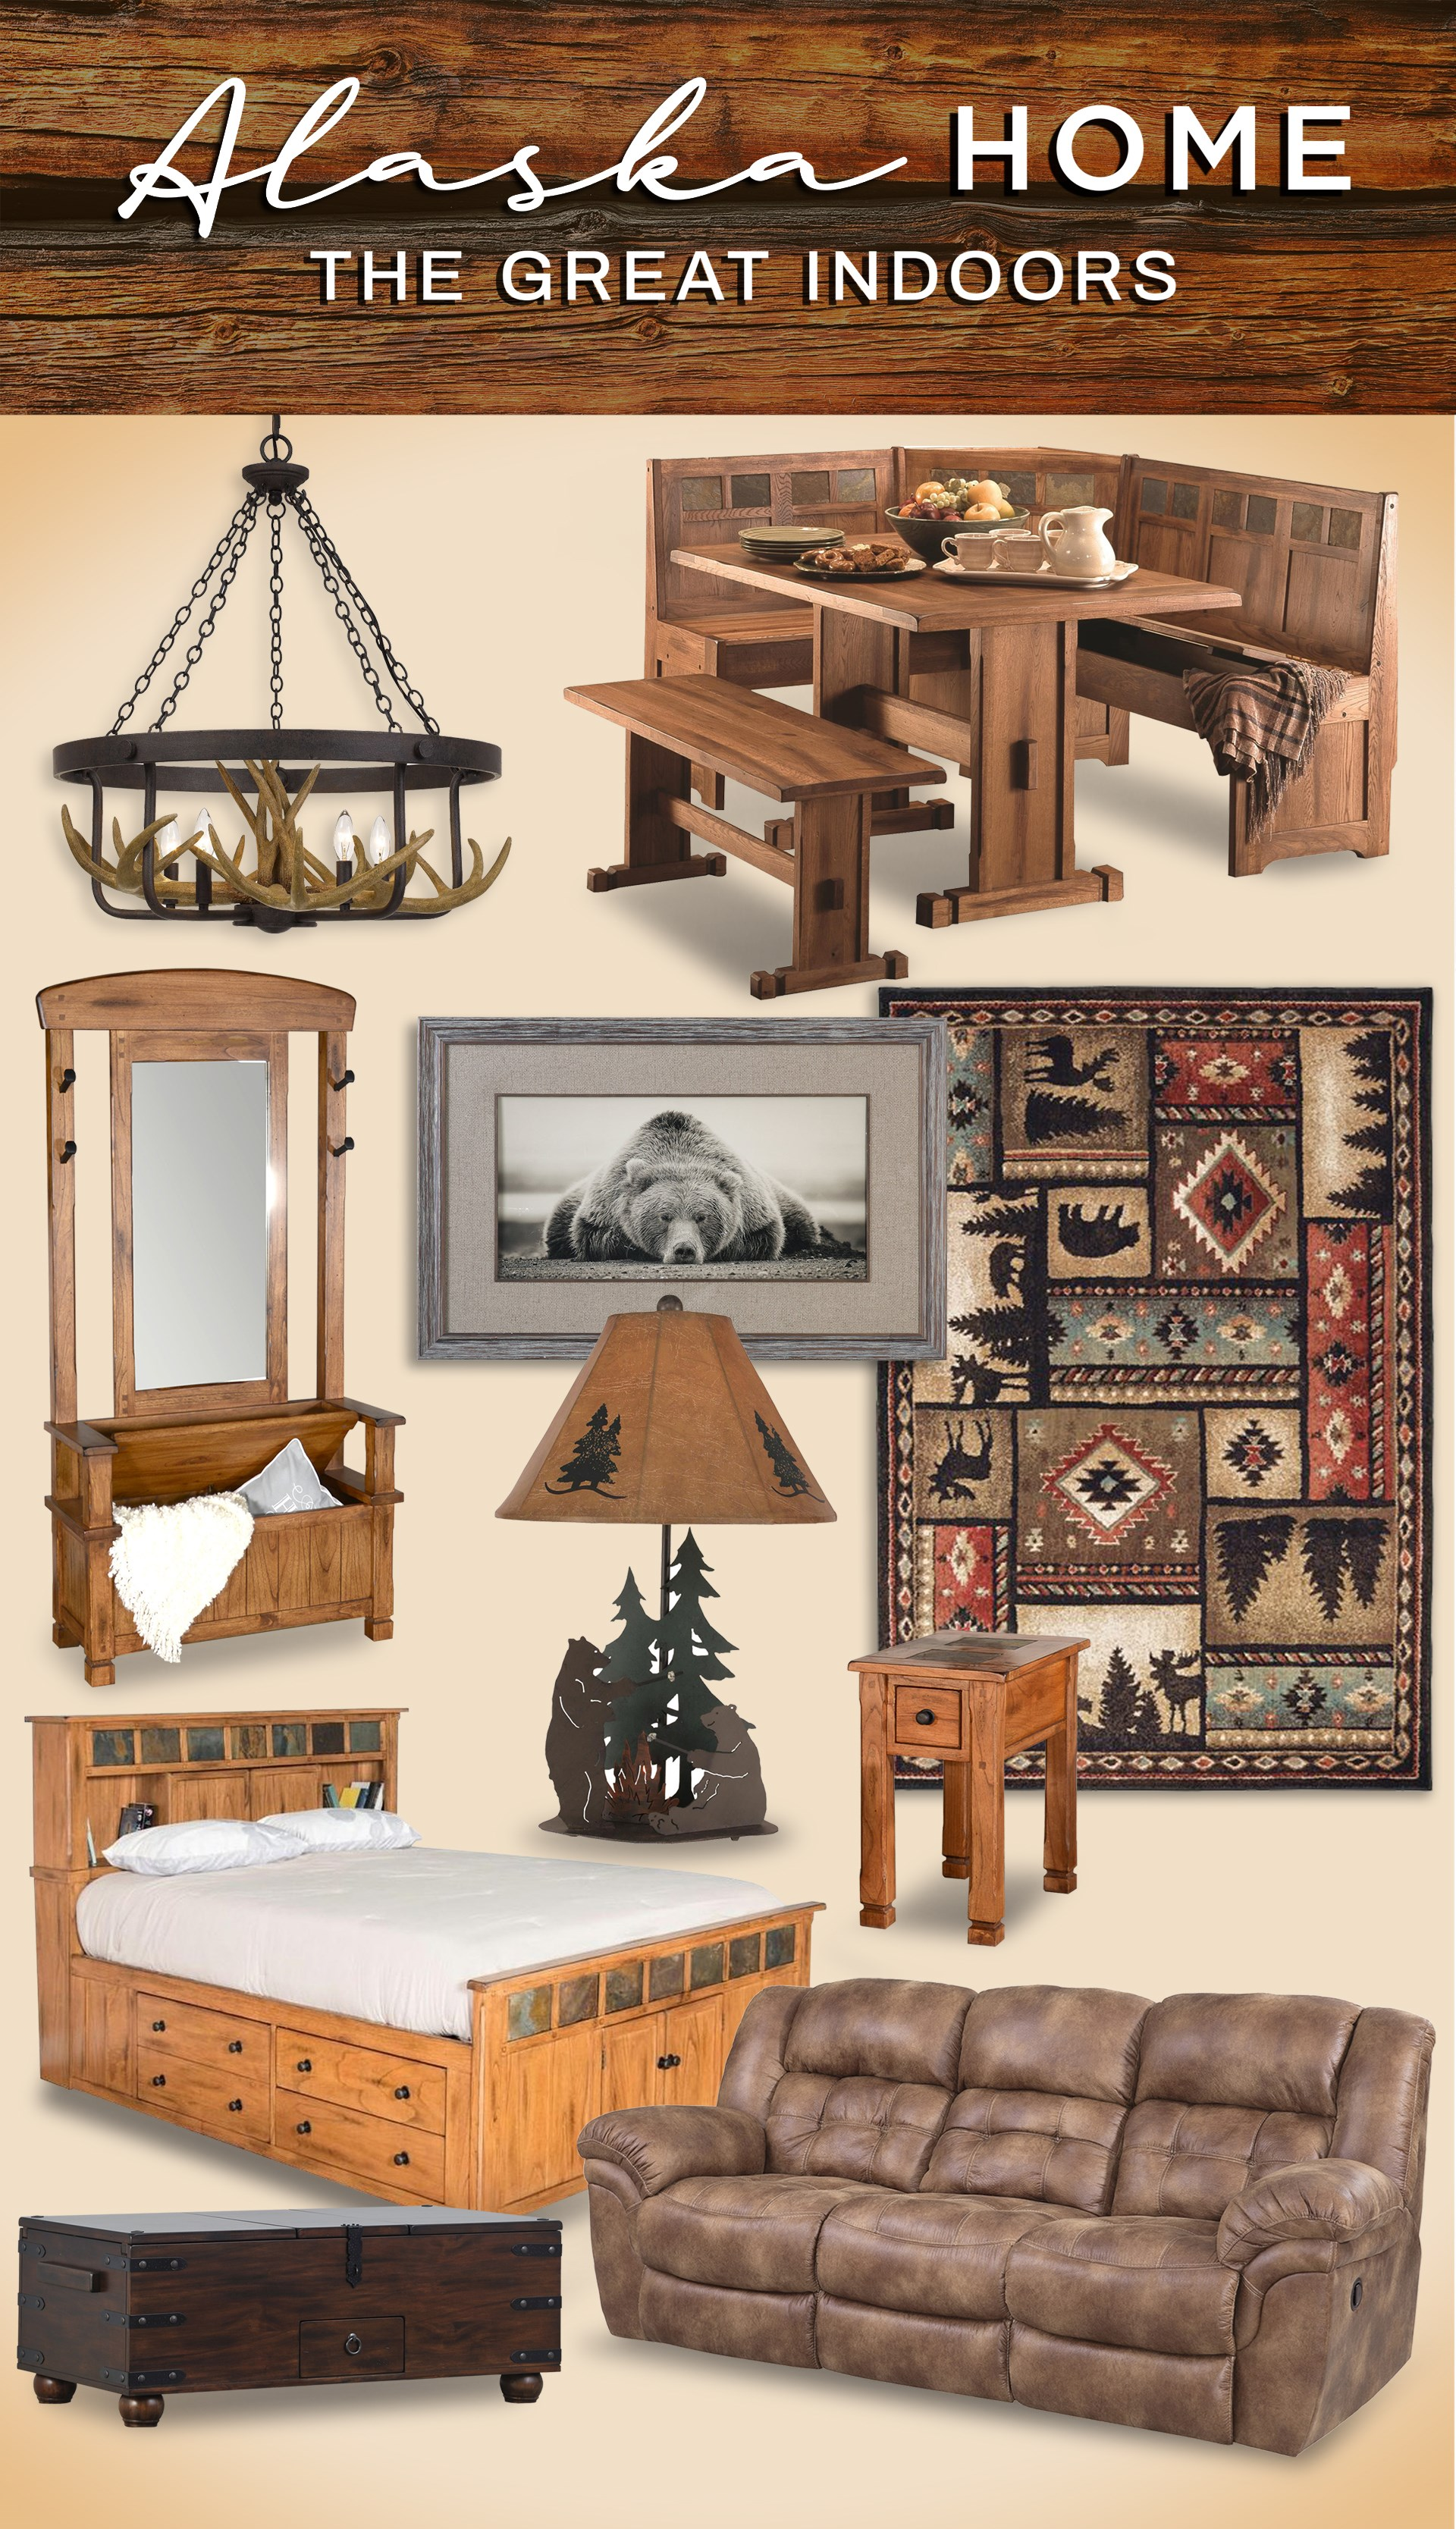 Alaska Home: The Great Indoors